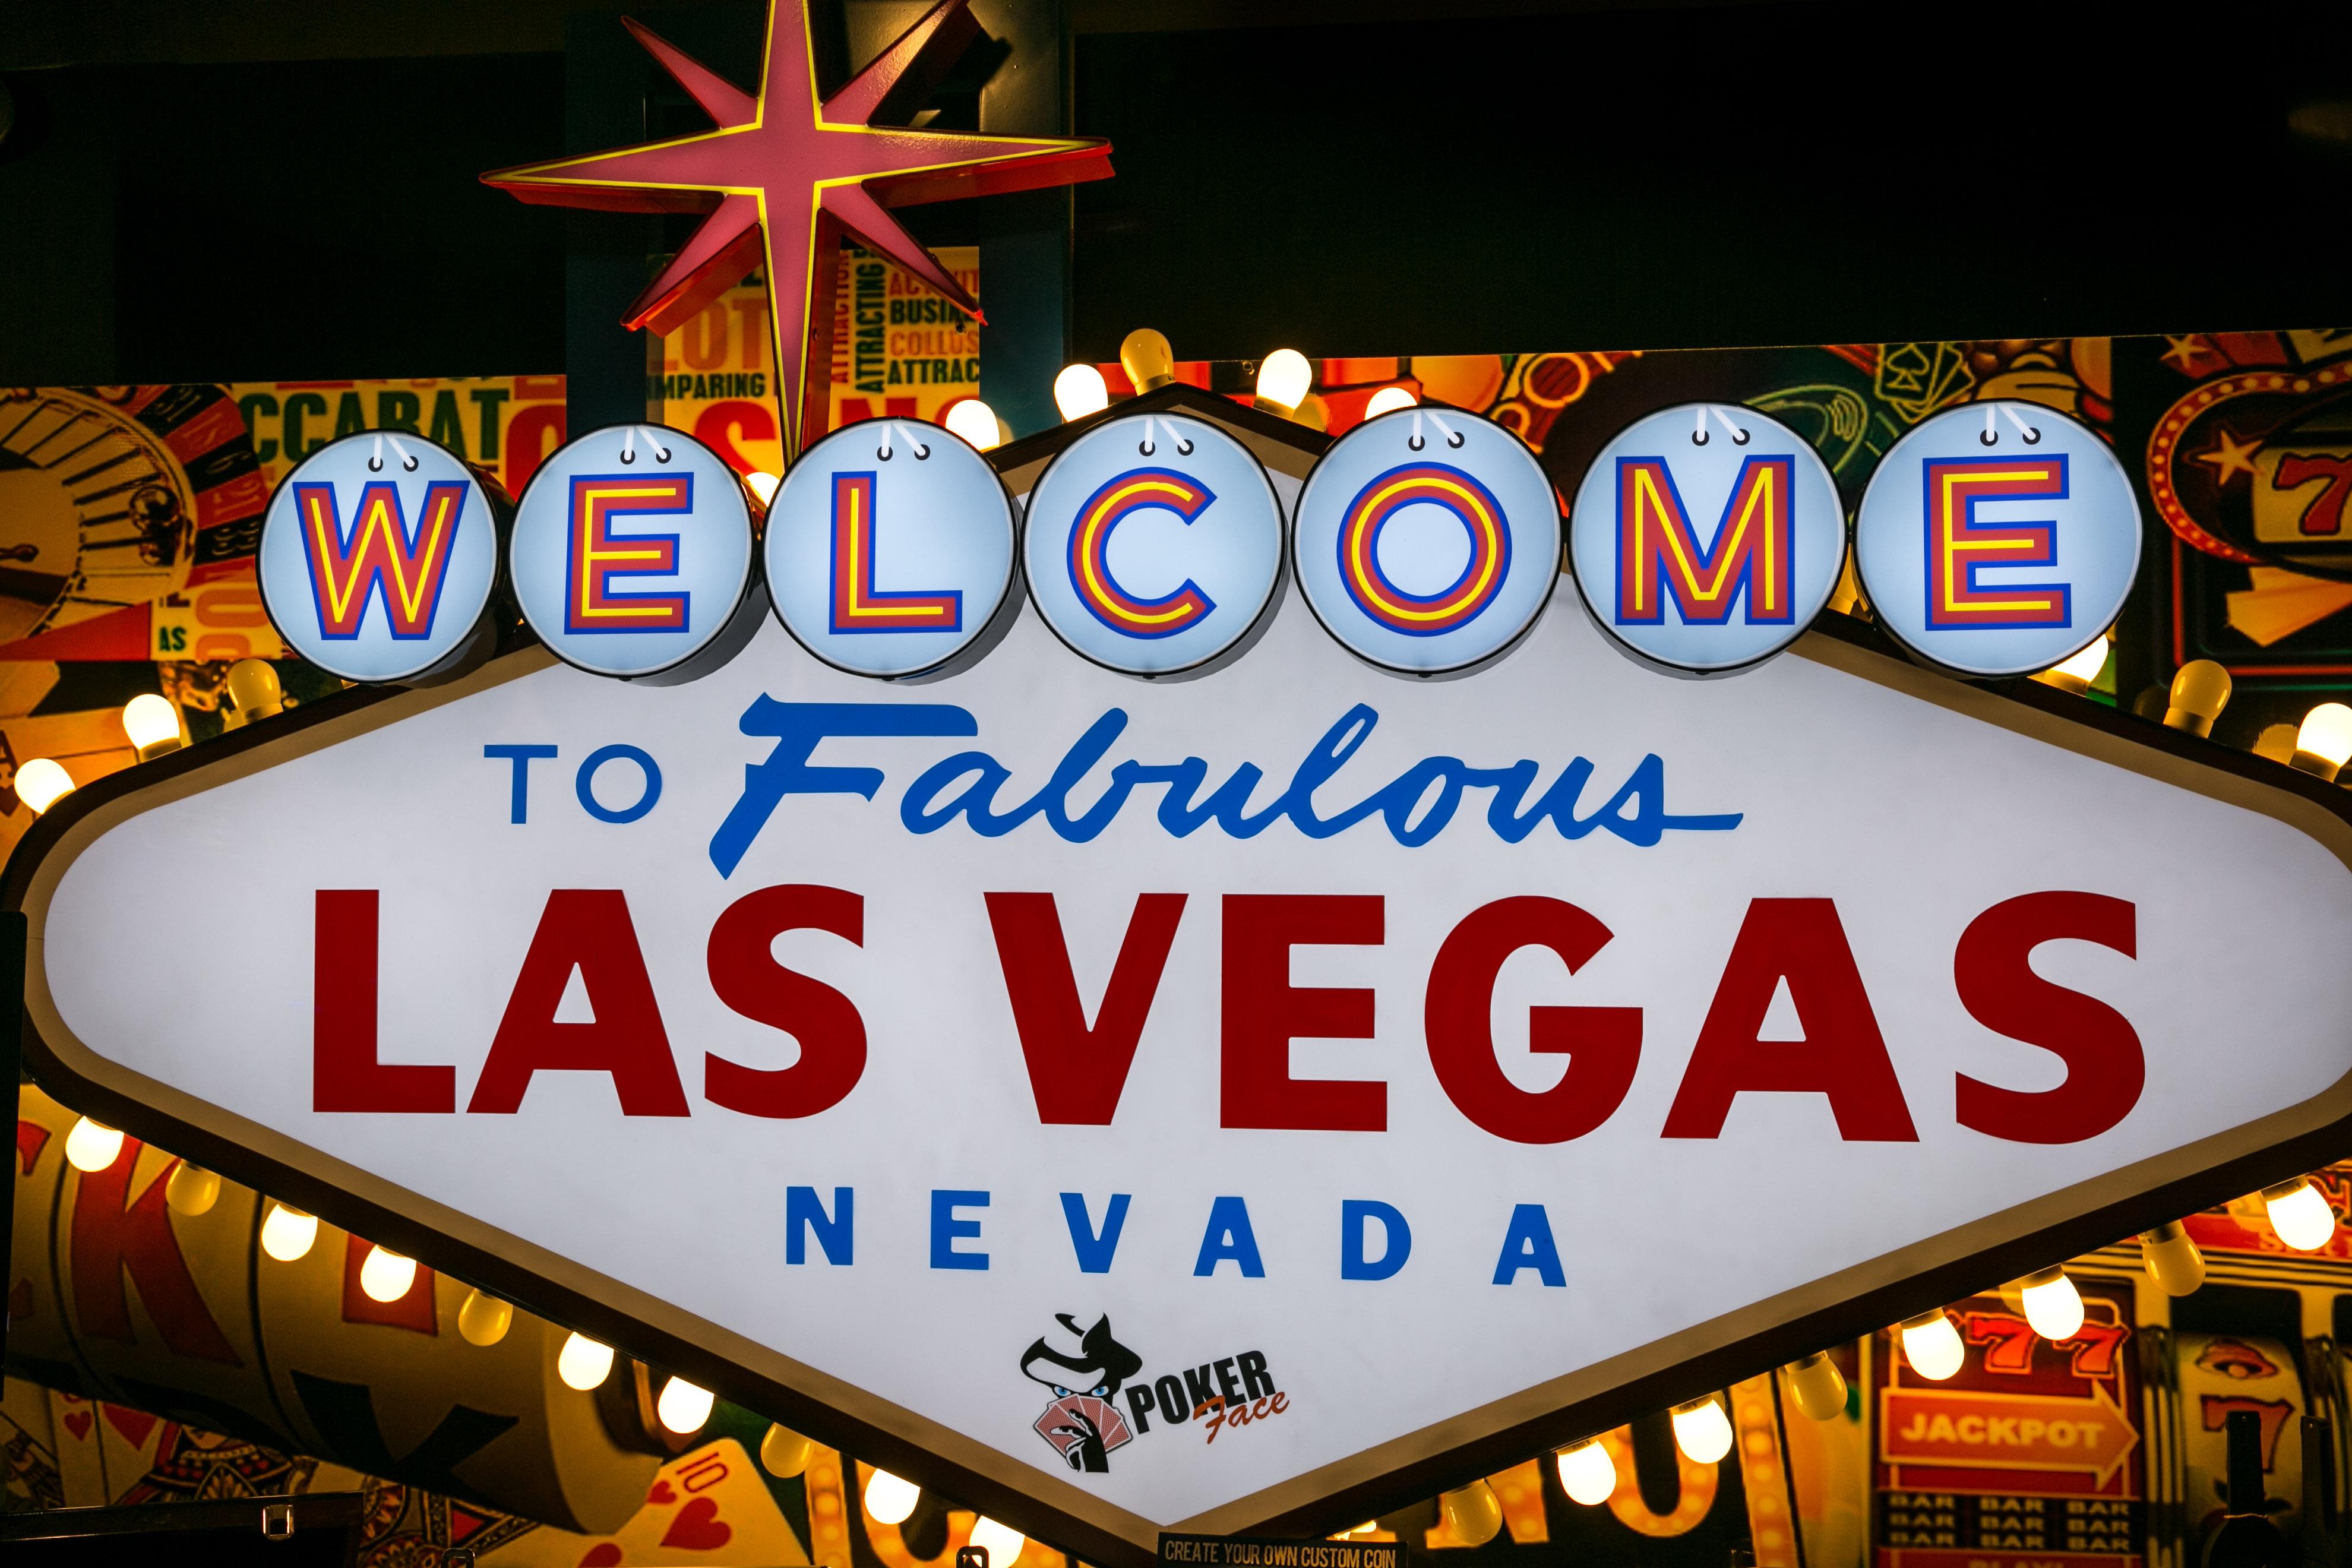 Tourism Continues to Drive Las Vegas Economy